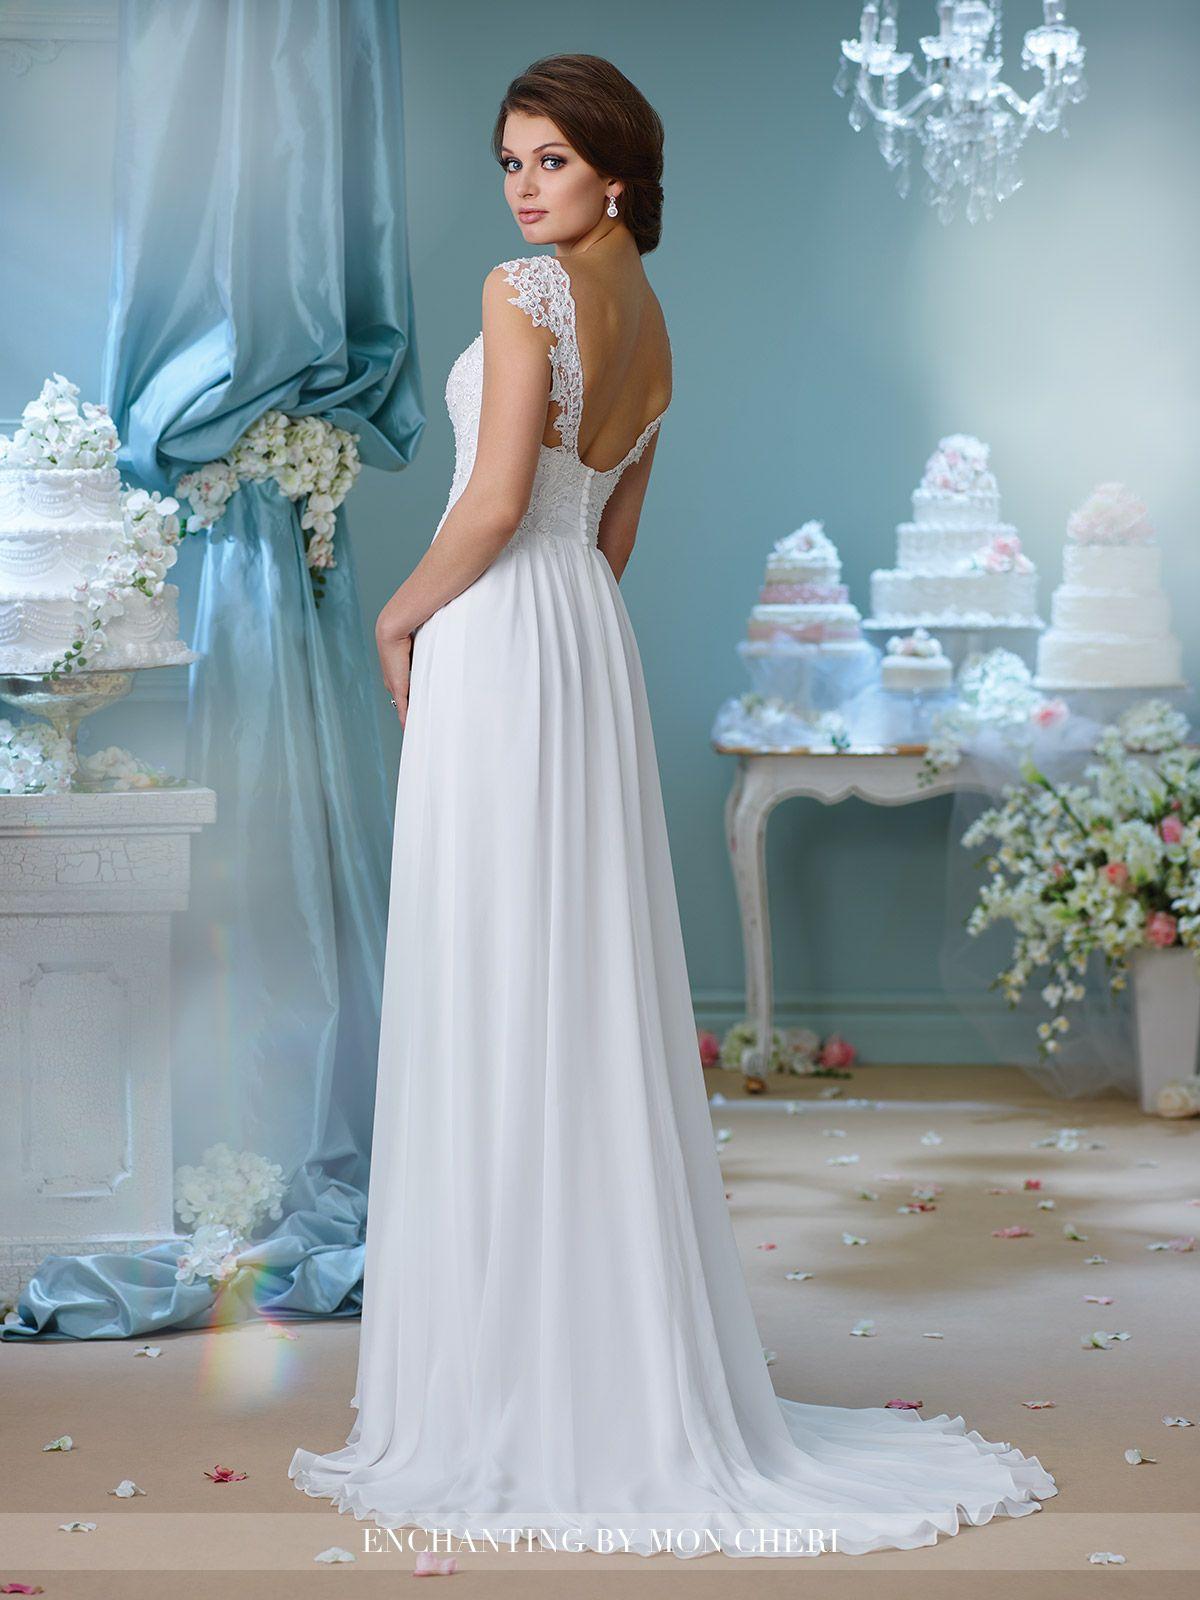 Illusion Cap Sleeve Wedding Dress- 216160- Enchanting by Mon Cheri ...